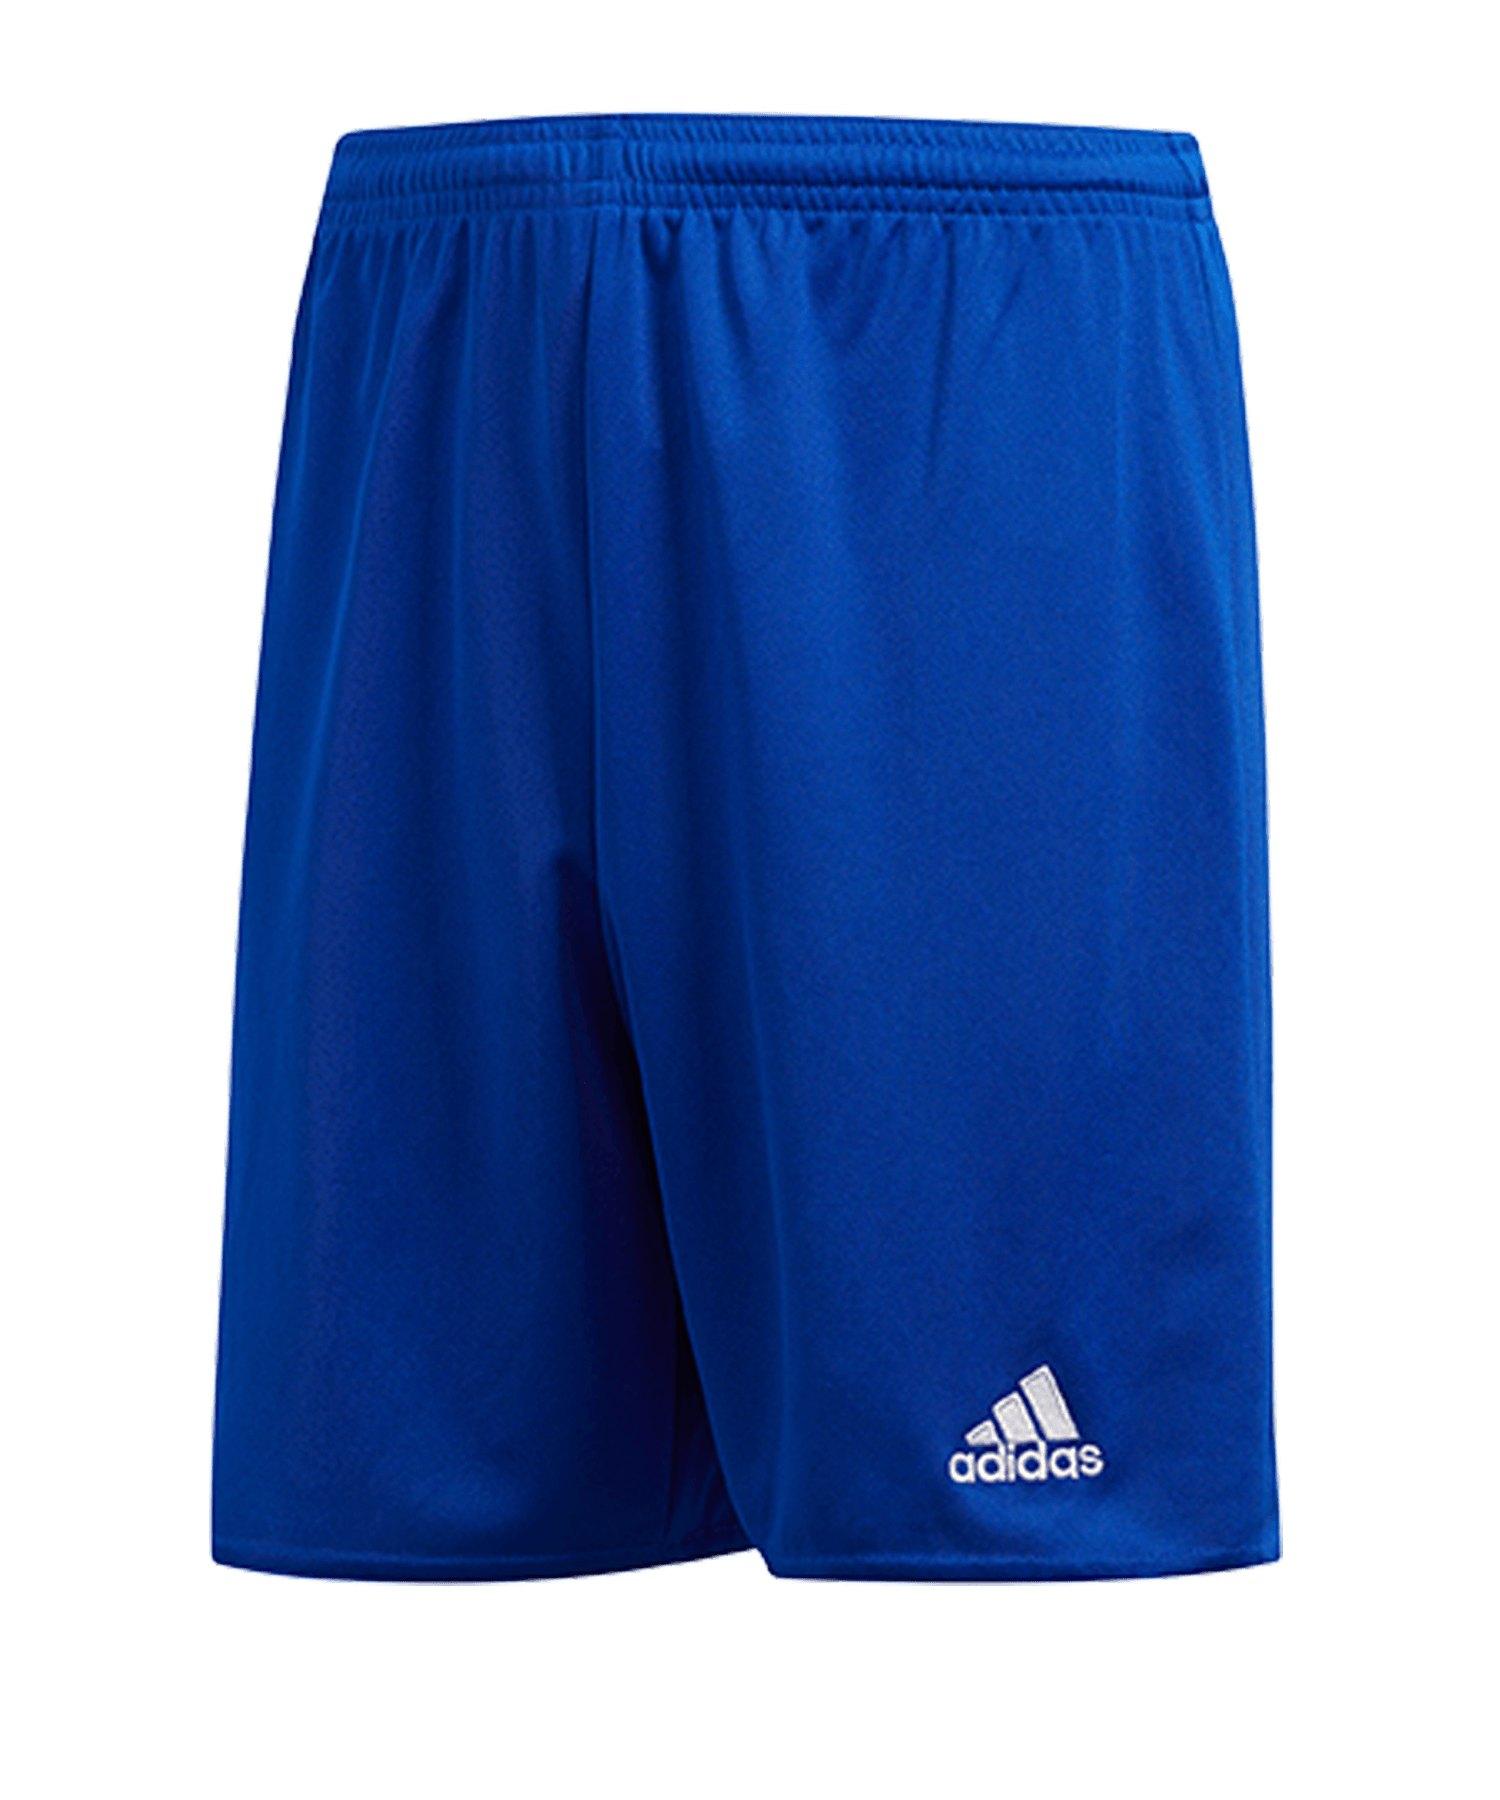 adidas Parma 16 Short Kids Blau Weiss - blau